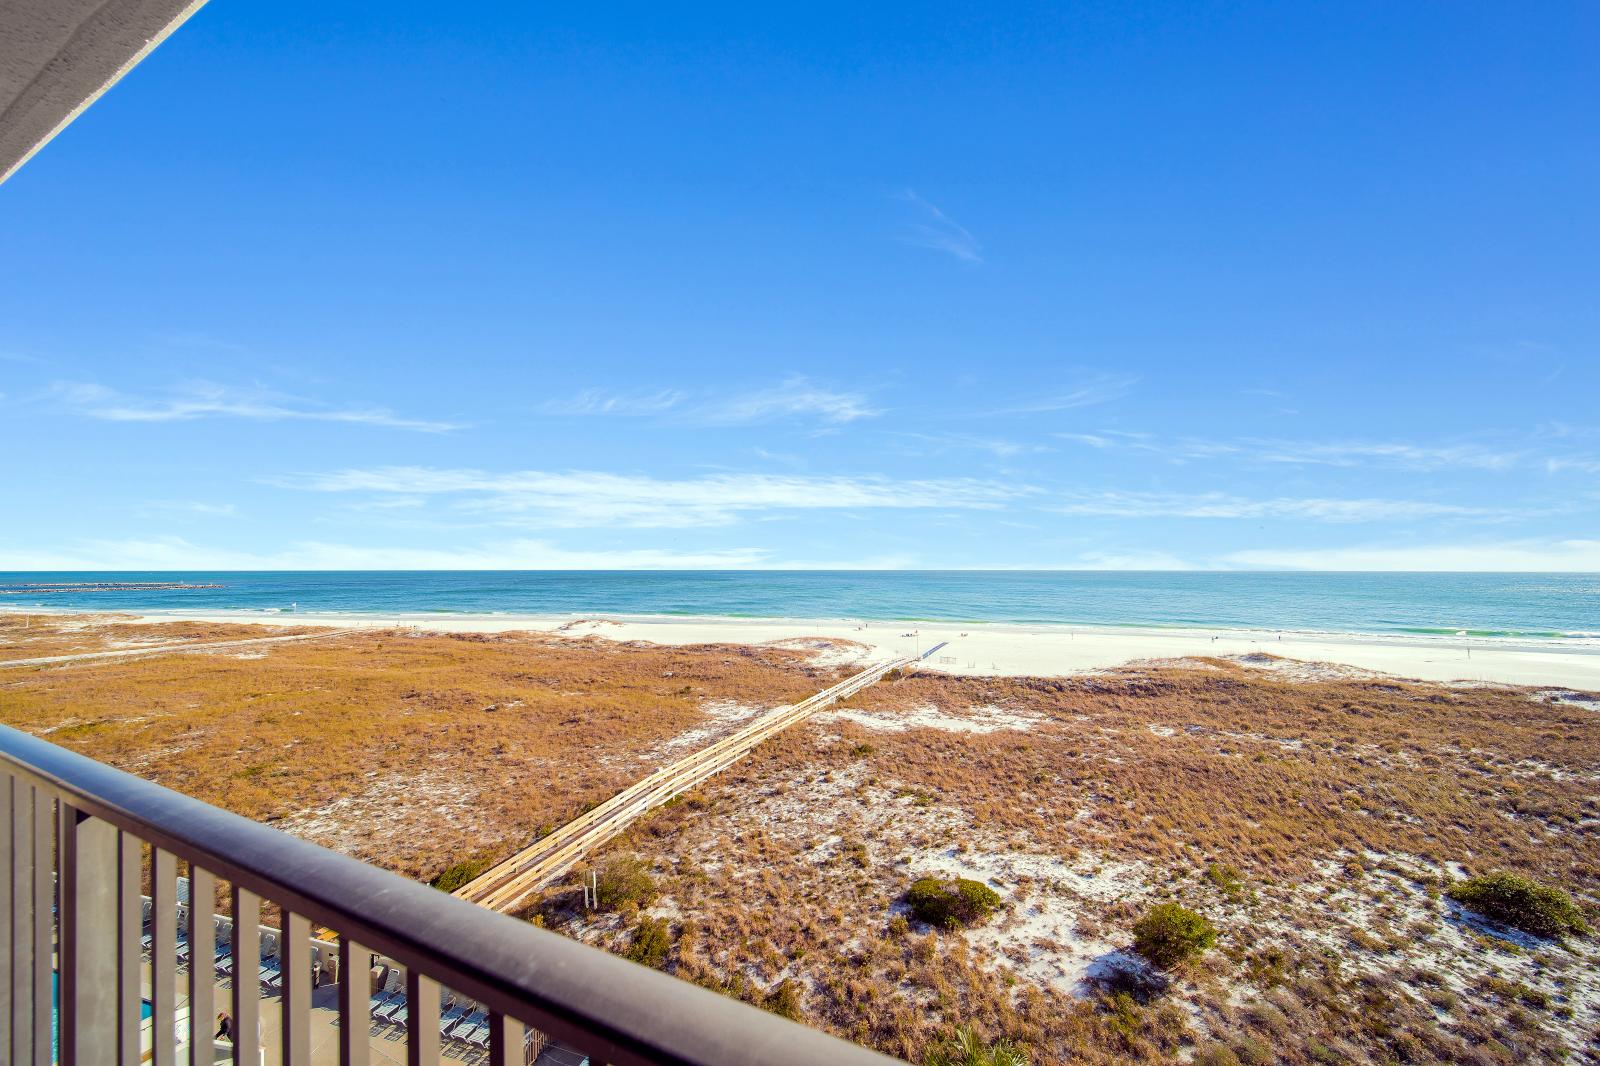 Beautiful View of White Sandy Beaches